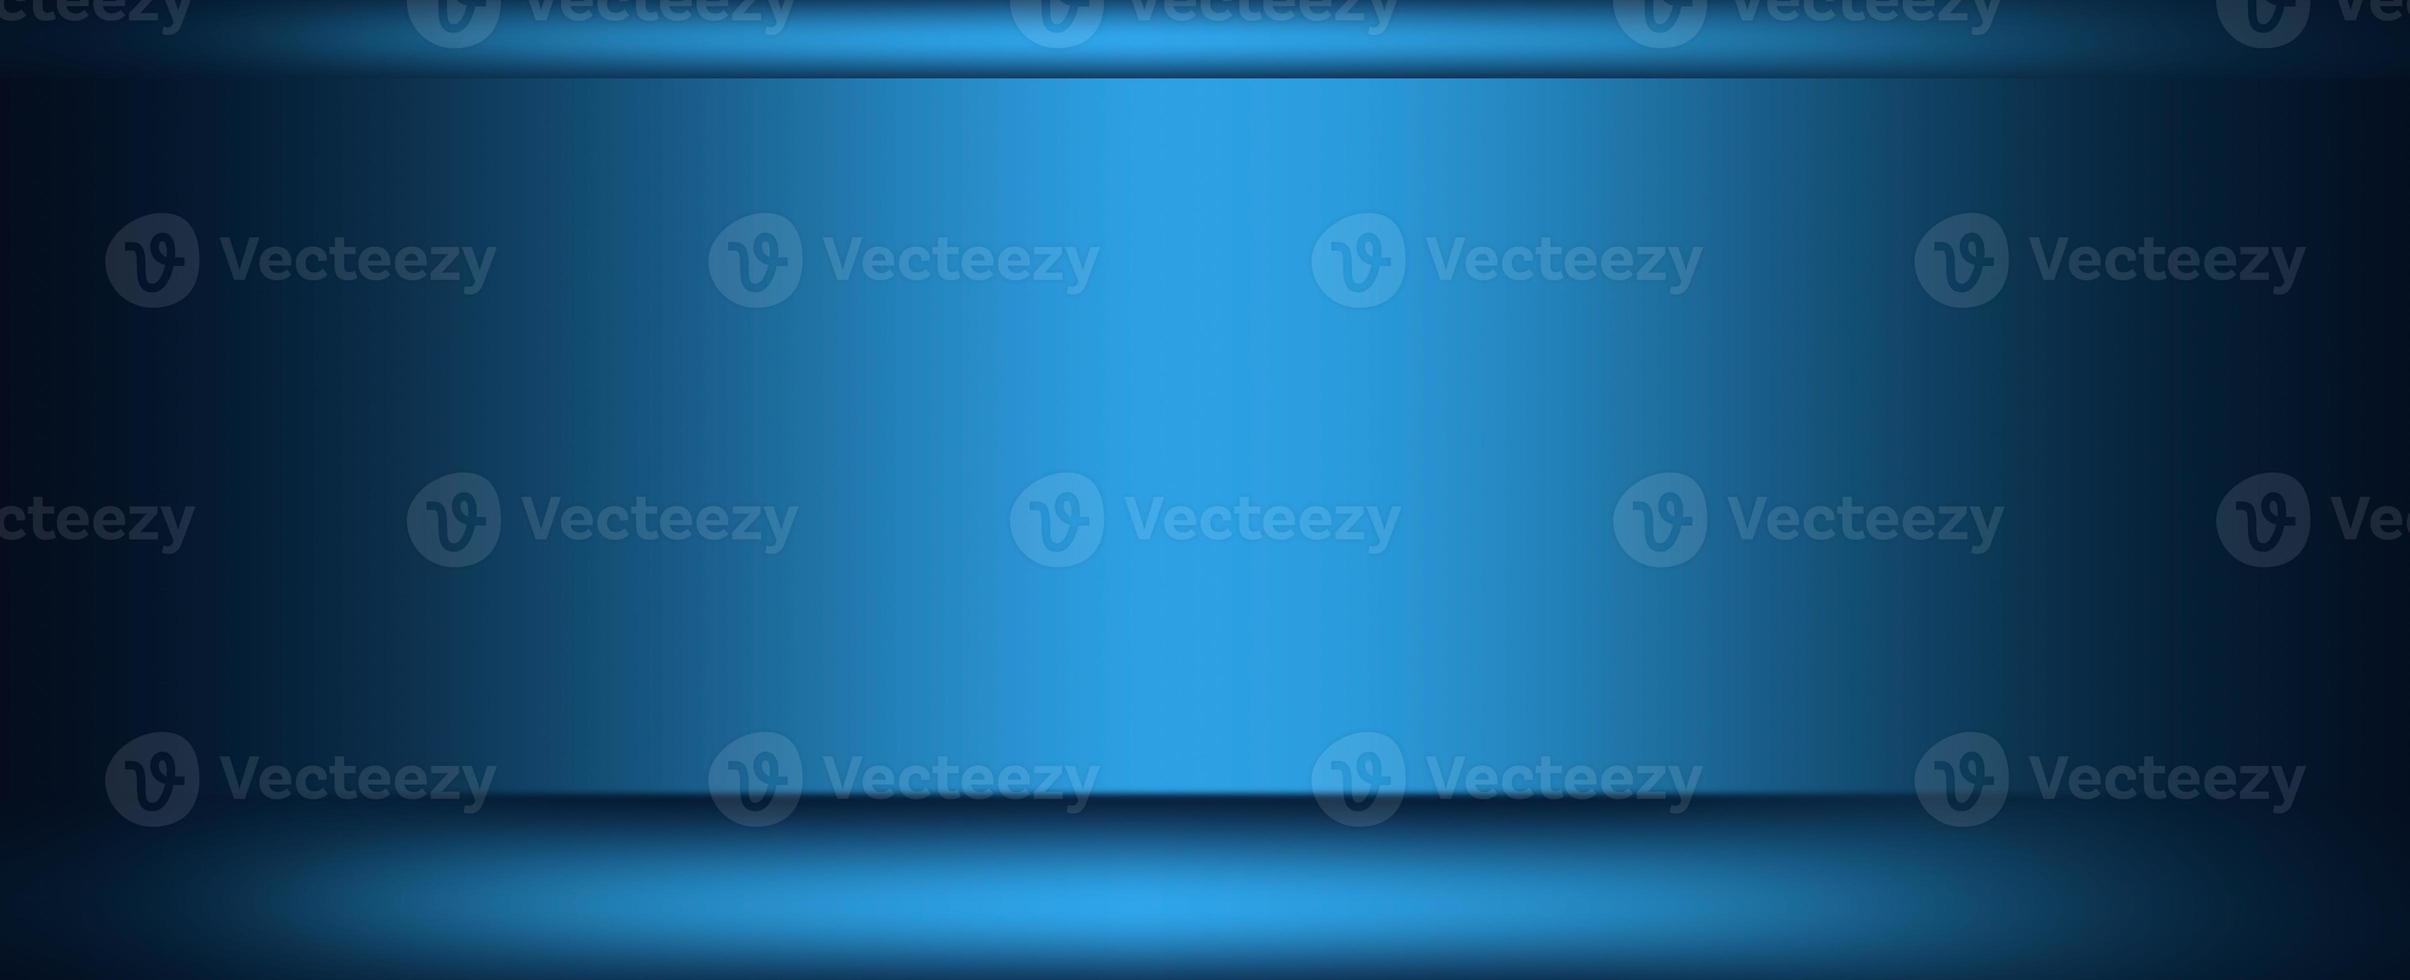 fondo de estudio de pared azul foto